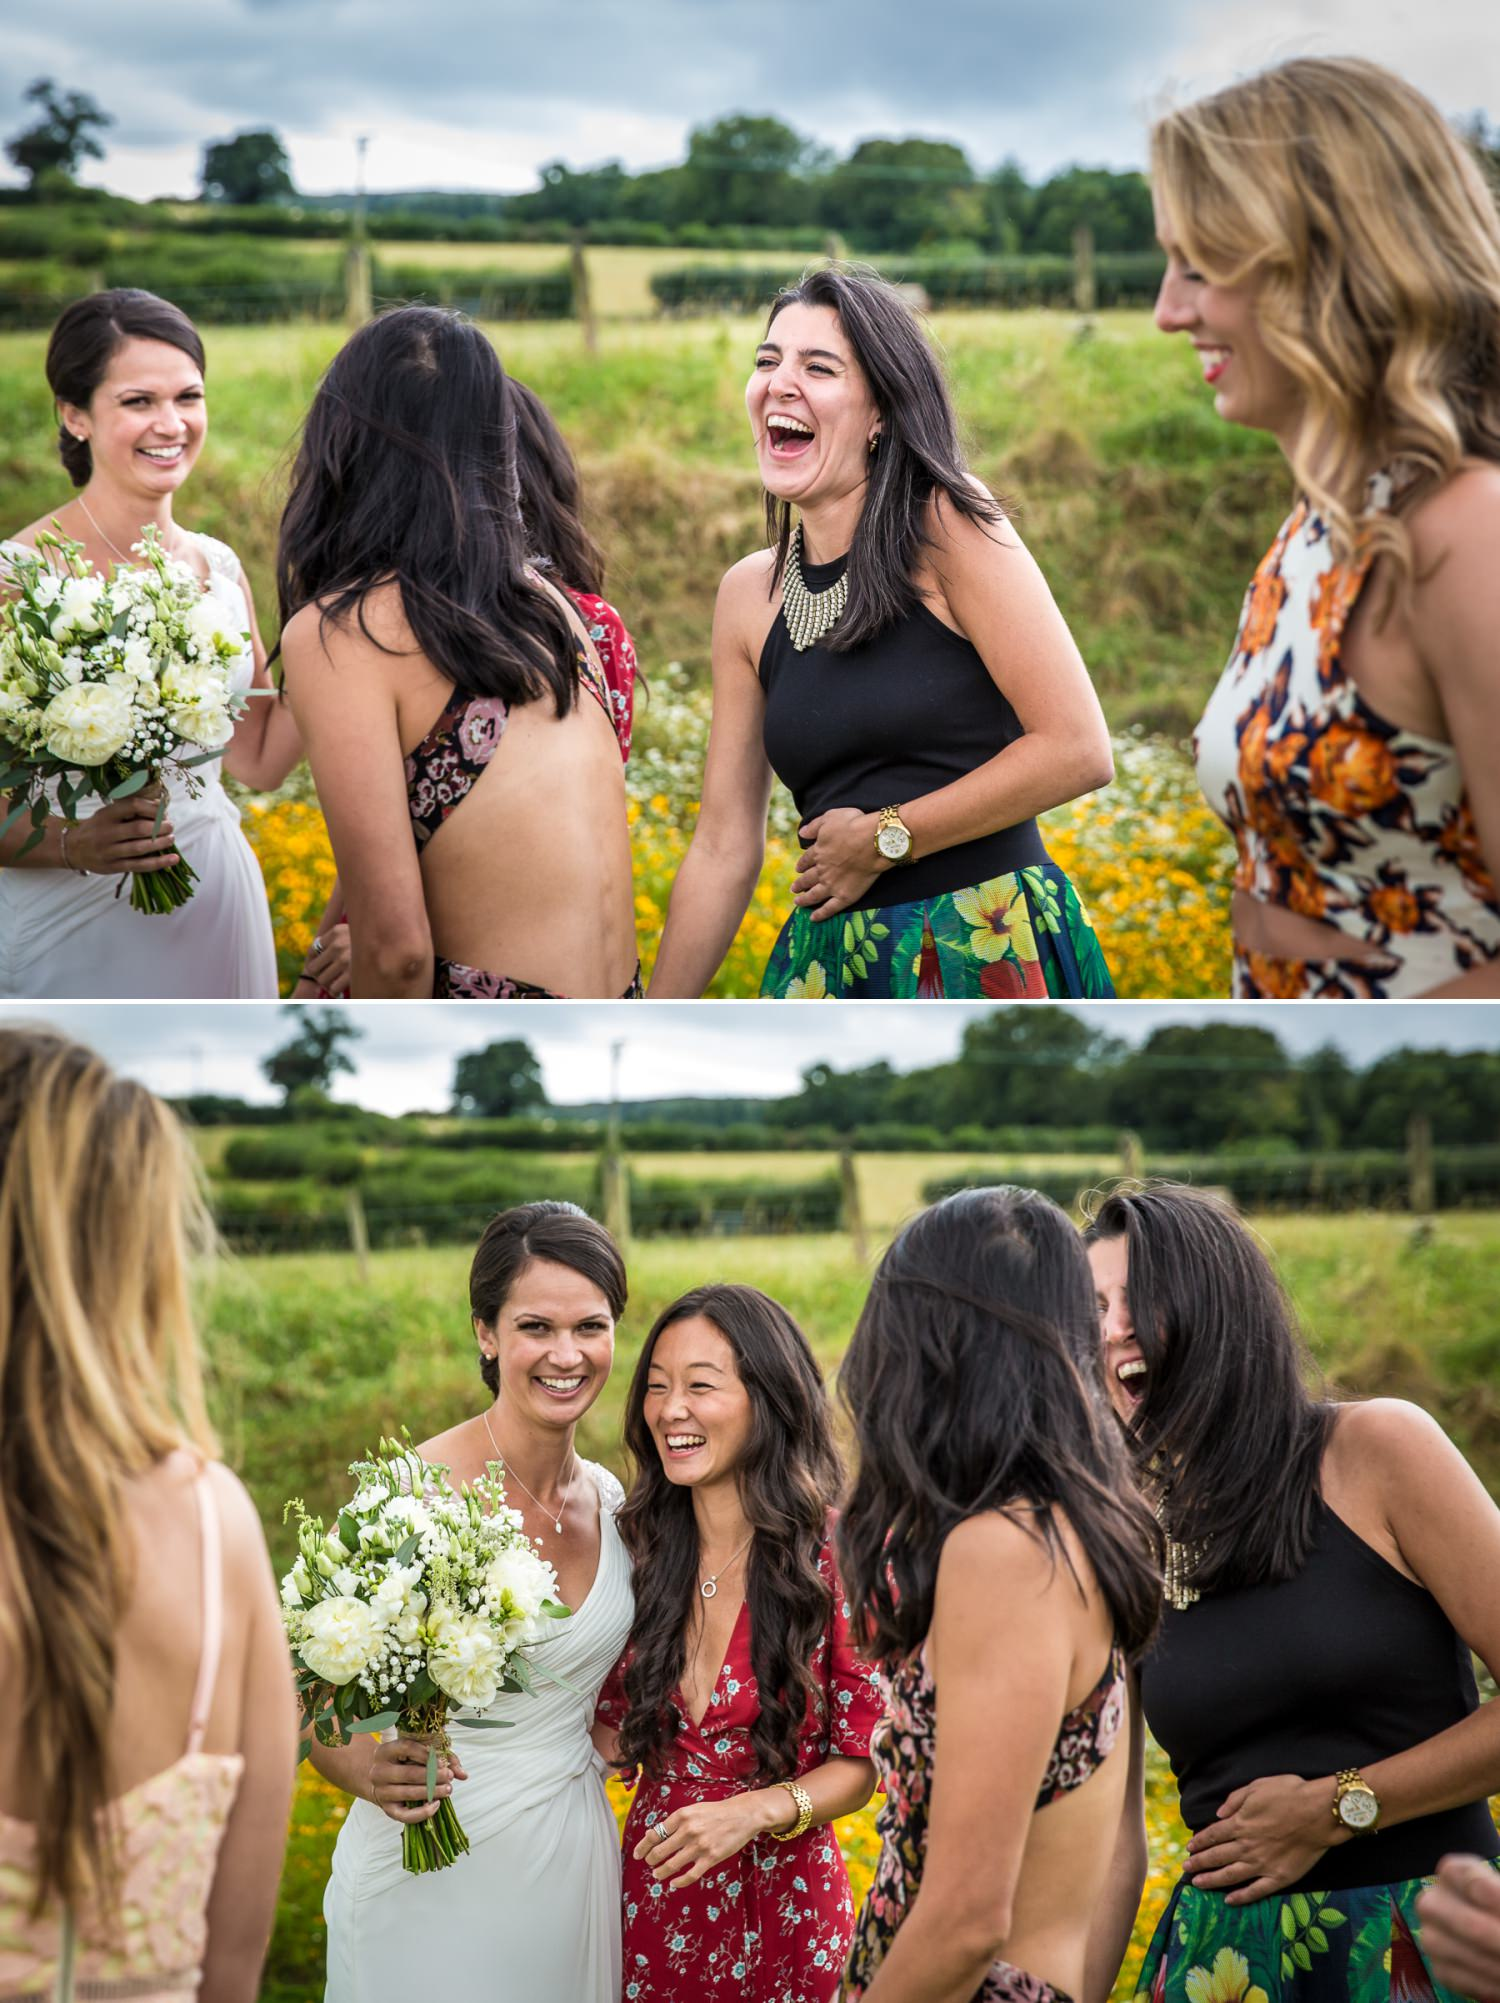 Wedding photographs of guests at Tower Hill Barns, Wrexham, North Wales